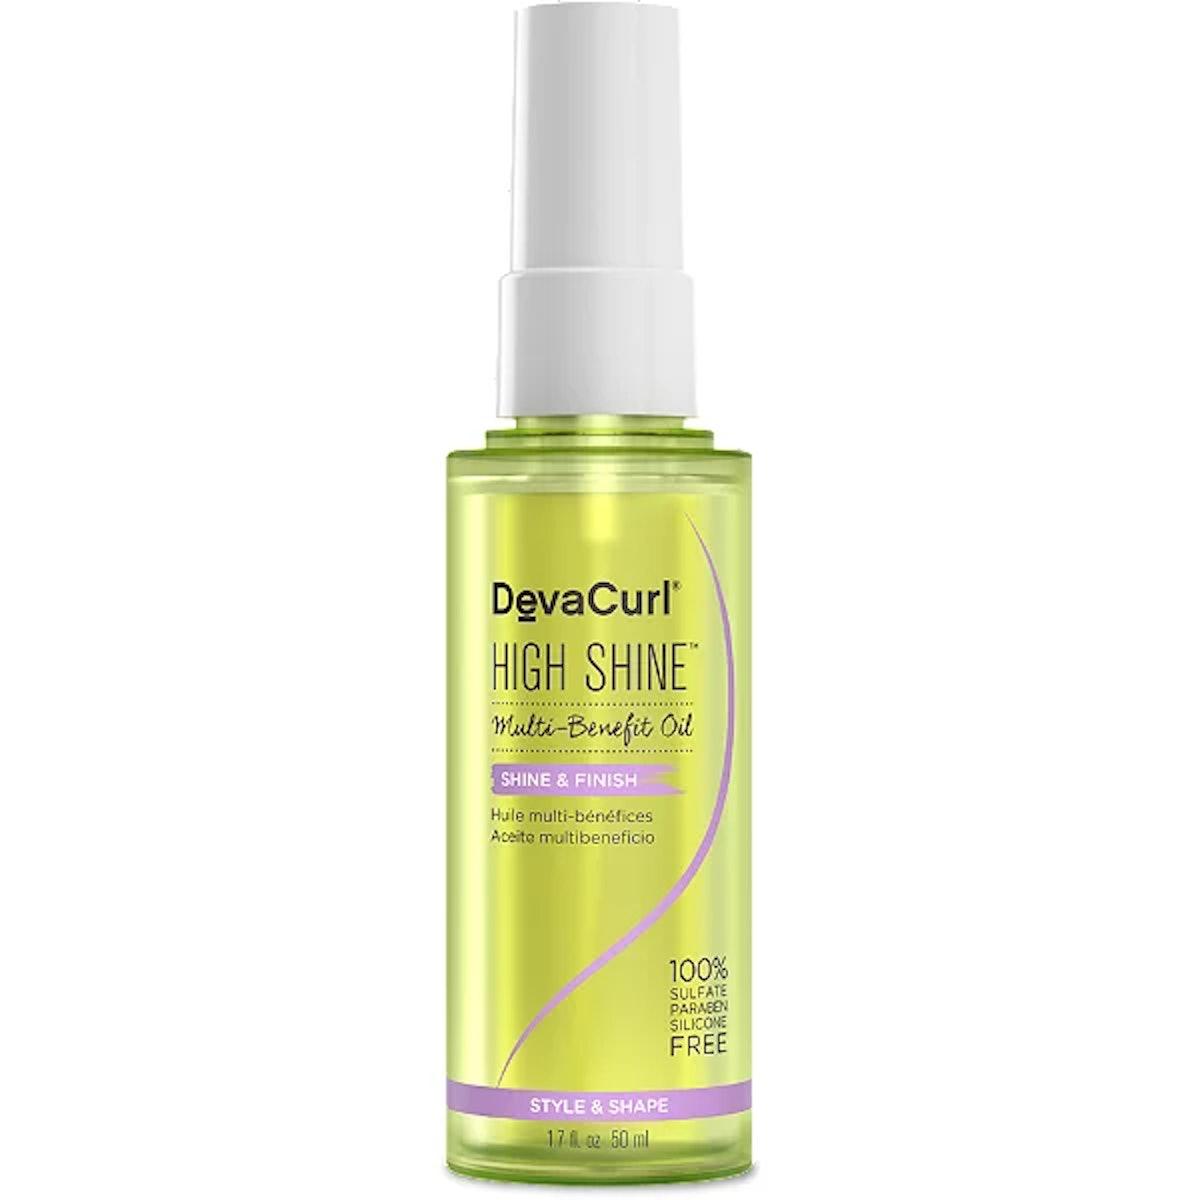 DevaCurl High Shine Multi-Benefit Hair Oil